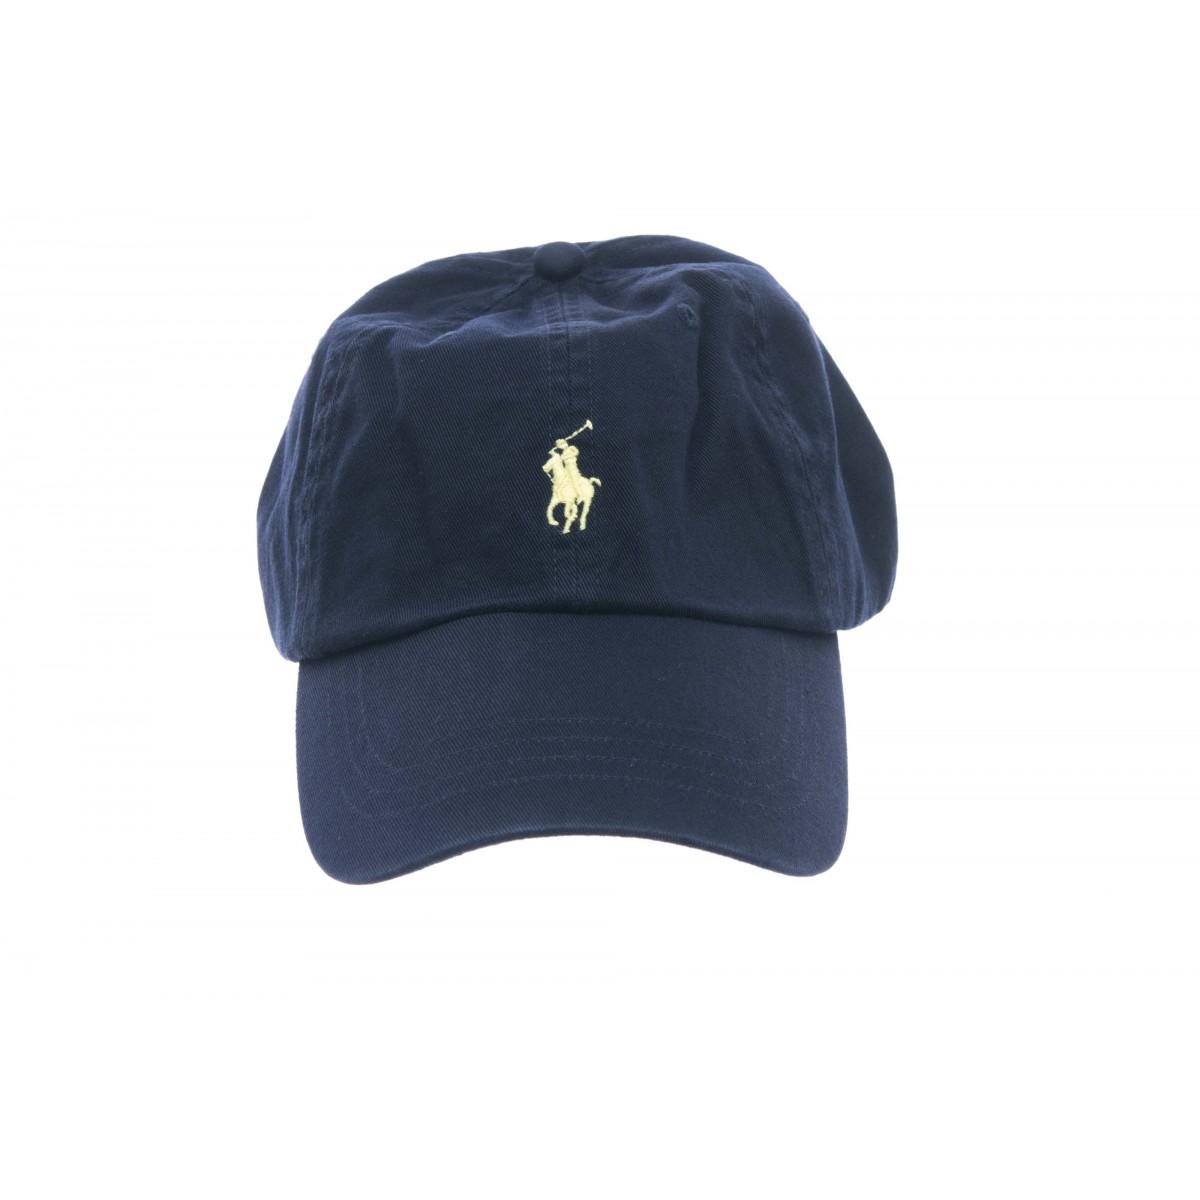 Berretto - 548524 cappellino visiera